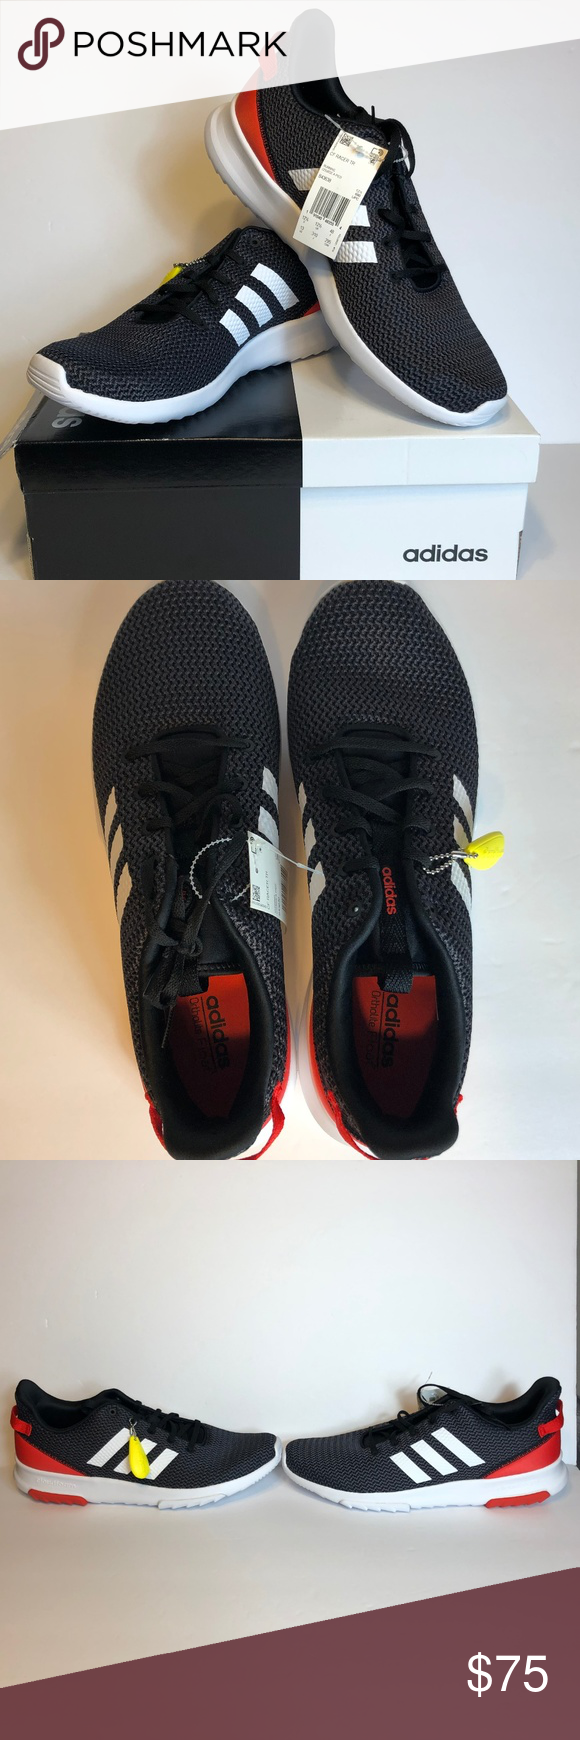 SOLD} Adidas Ortholite CF Racer Running